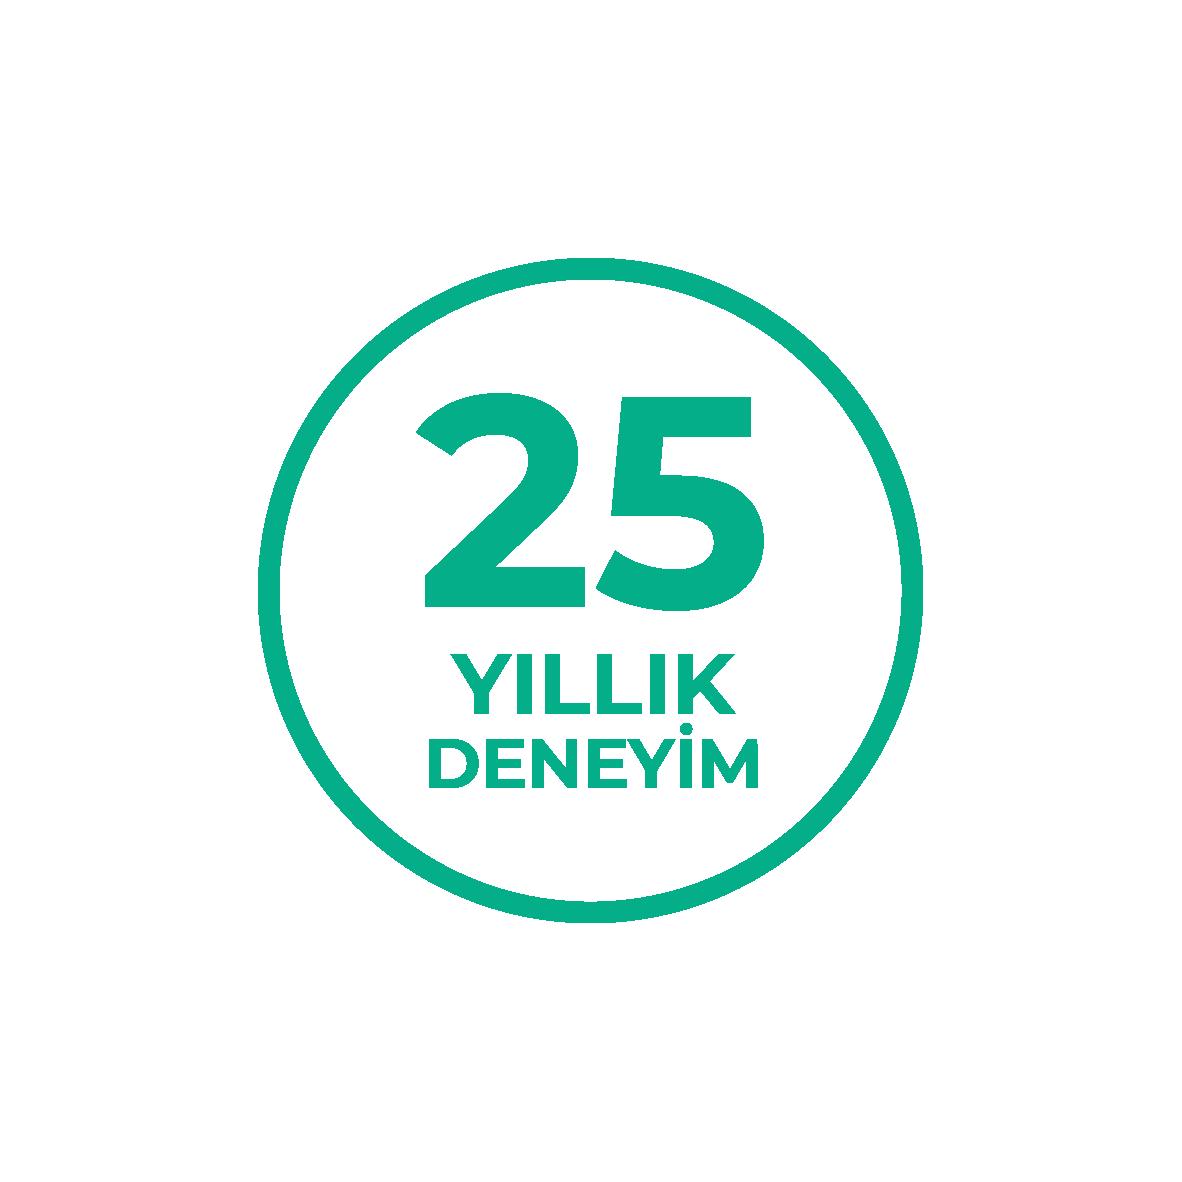 https://yesiltepepoliklinigi.com/wp-content/uploads/2021/04/Memnuniyet_Calisma-Yuzeyi-1-2.png